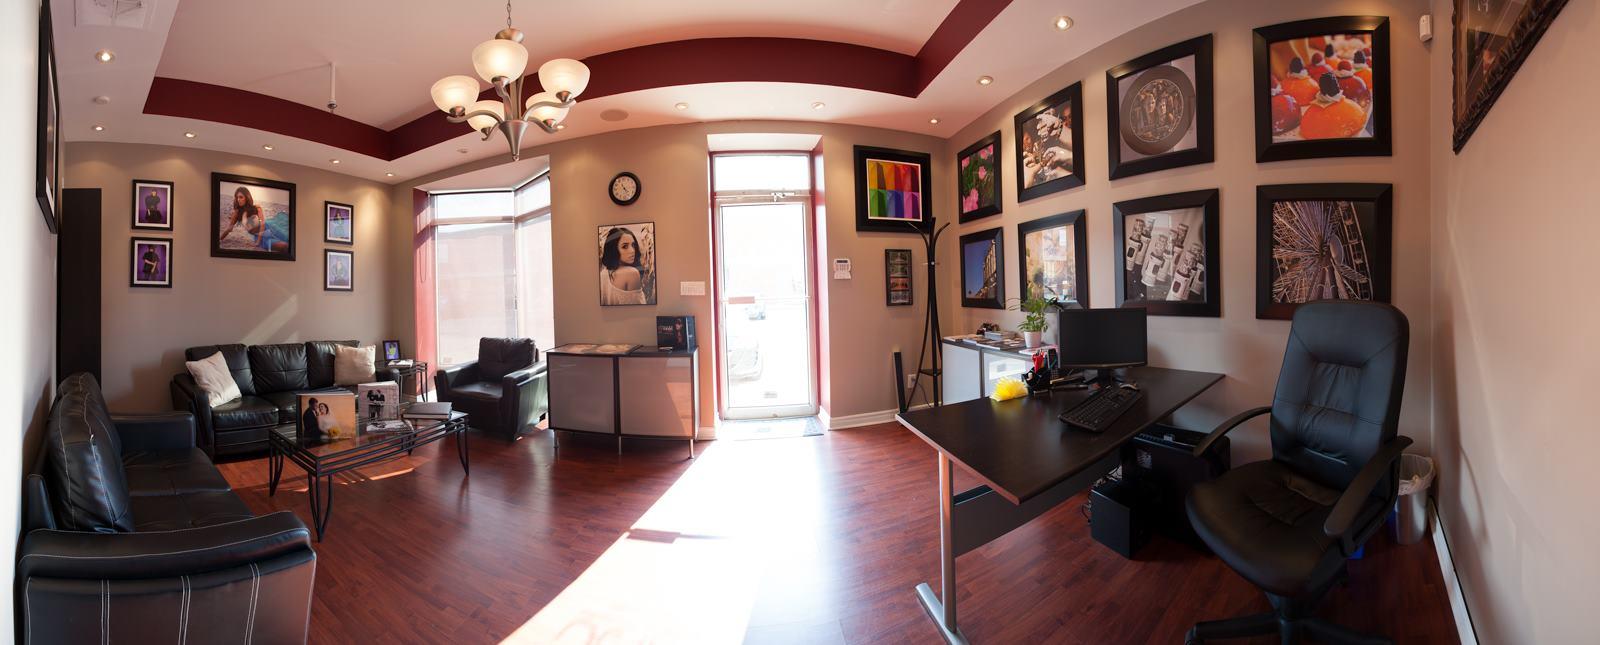 , 5004 Timberlea Blvd Unit# 33, Mississauga, Ontario , l4w 2s6 , Canada